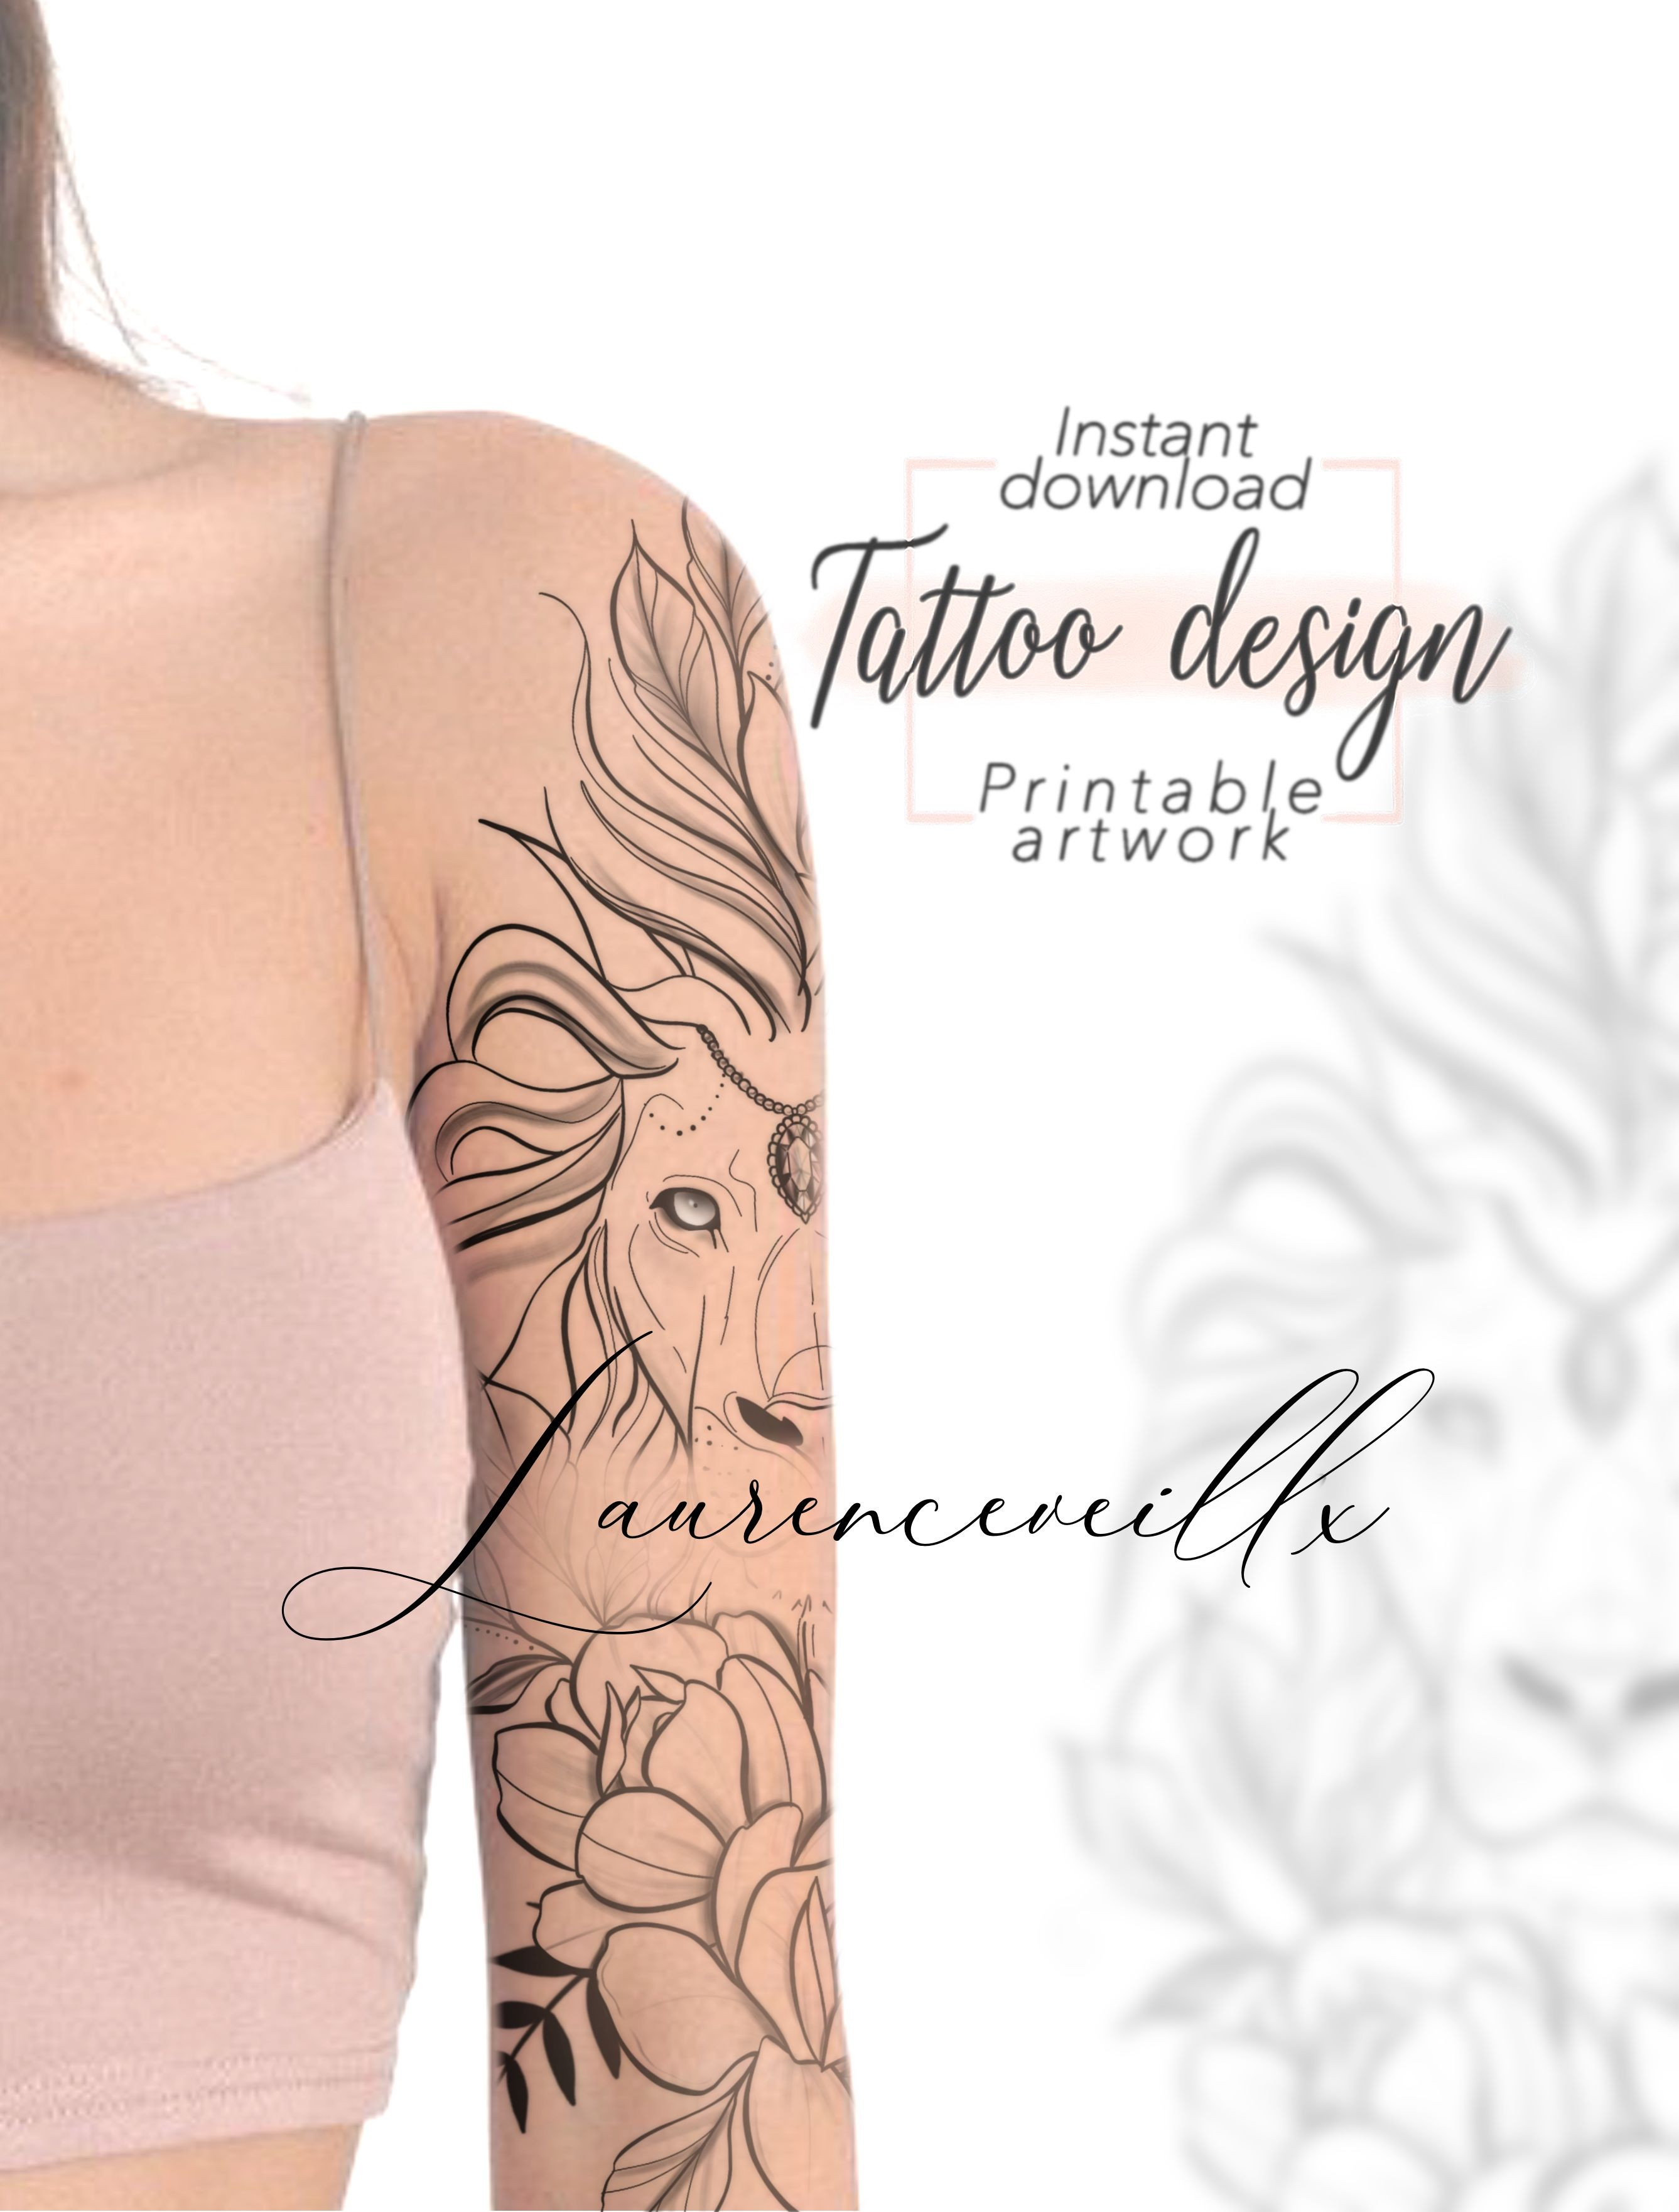 Printable Tattoo Design For Women Custom Thigh Tattoo Drawing Feminine Floral Unique Tattoo Printable Template Animal Lion Drawing Tattoo Designs For Women Unique Tattoos Tattoos